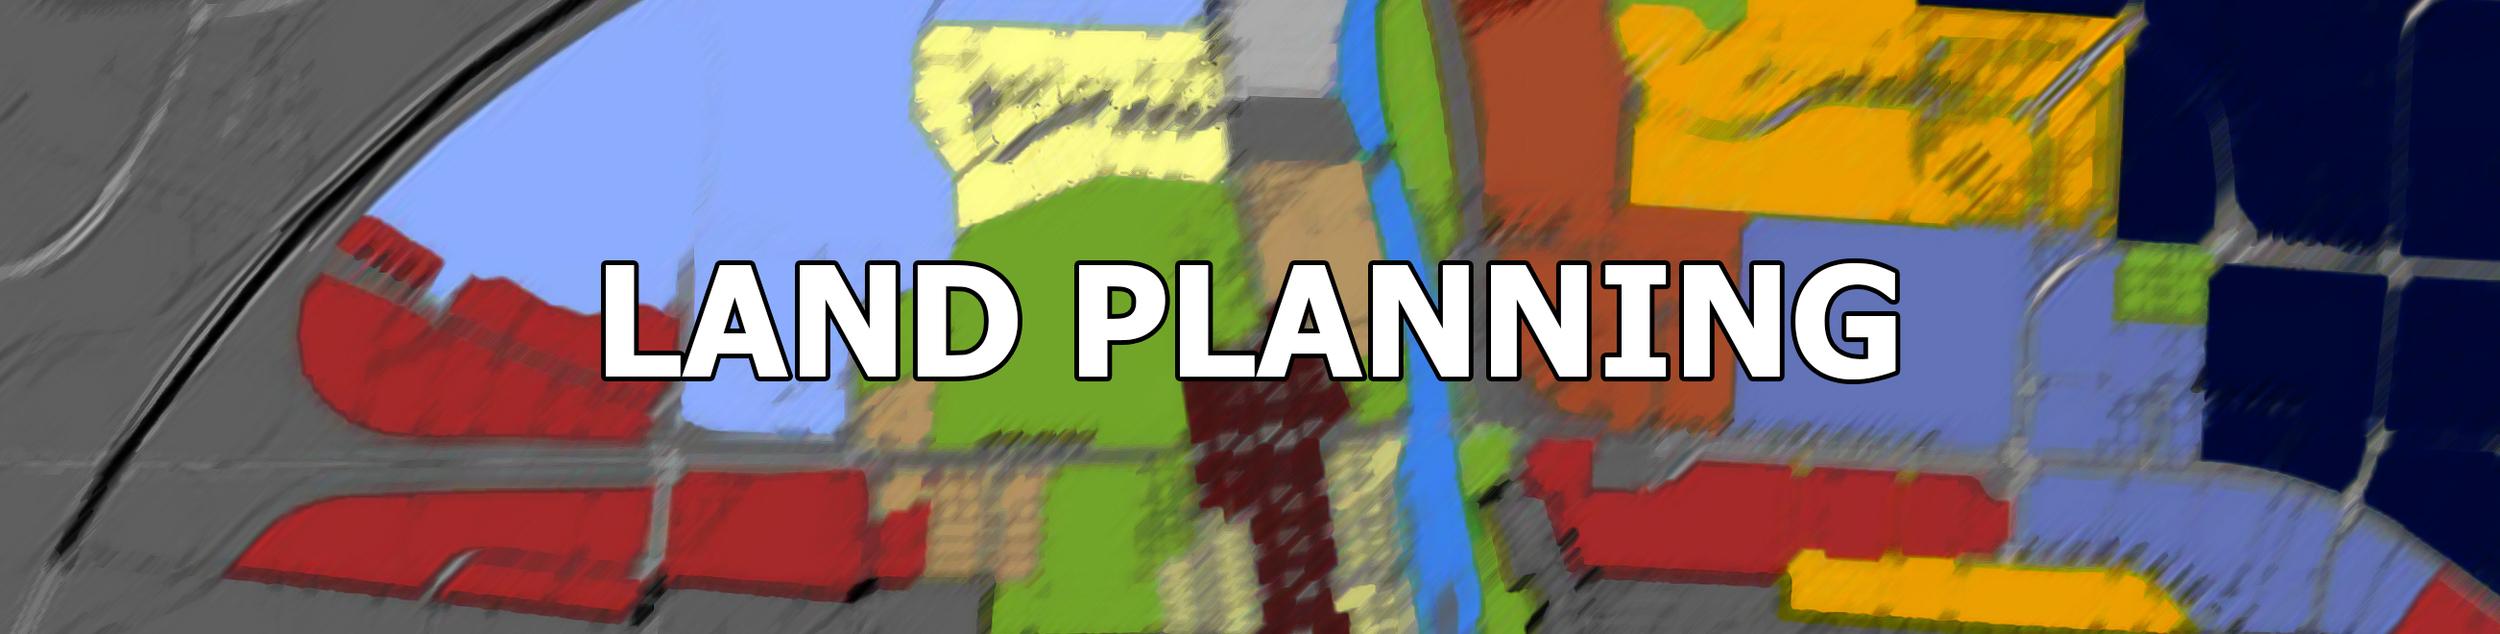 LandPlanning.jpg